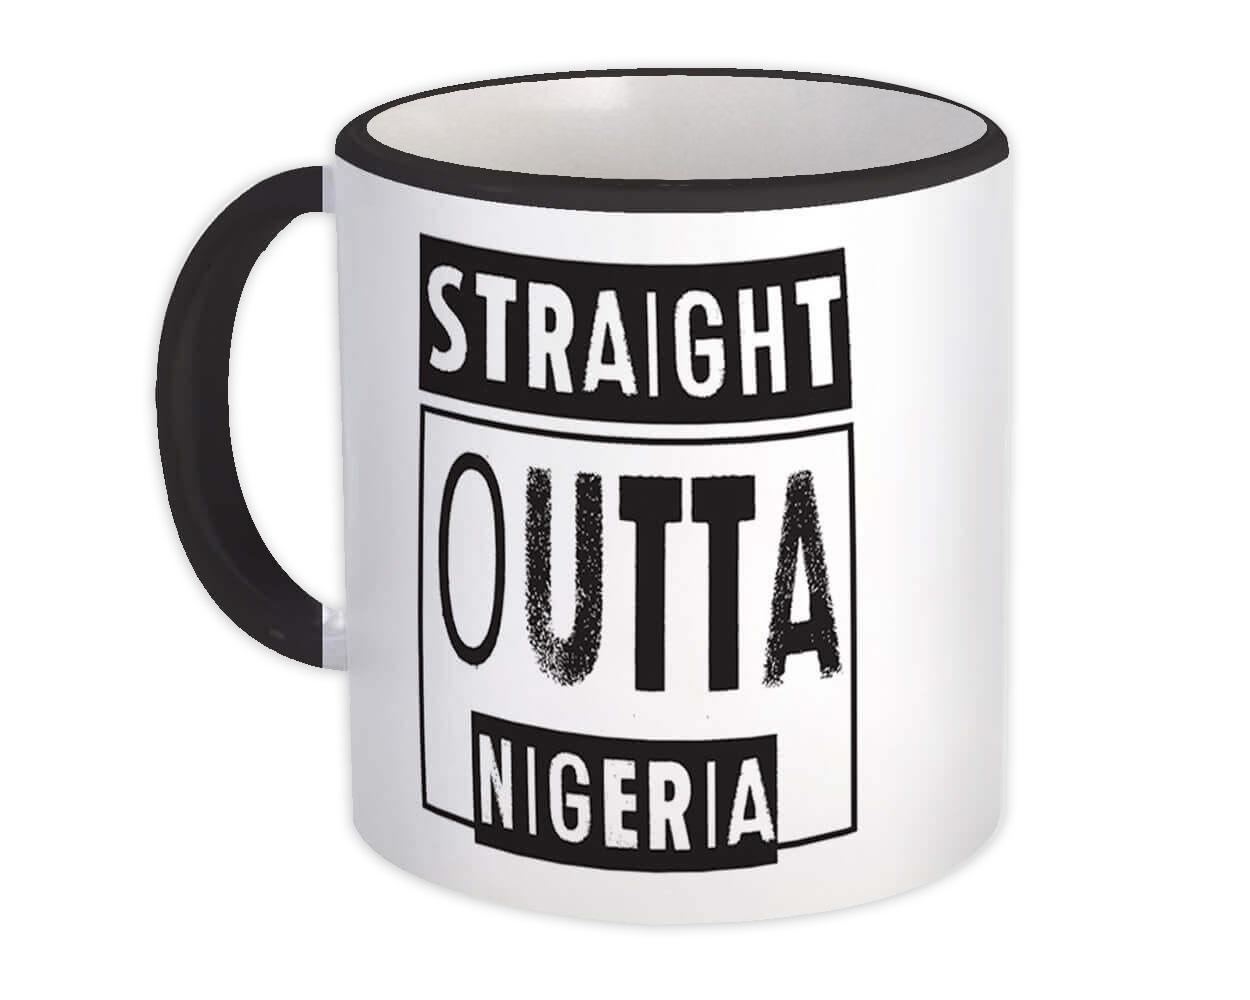 Straight Outta Nigeria : Gift Mug Expat Country Nigerian